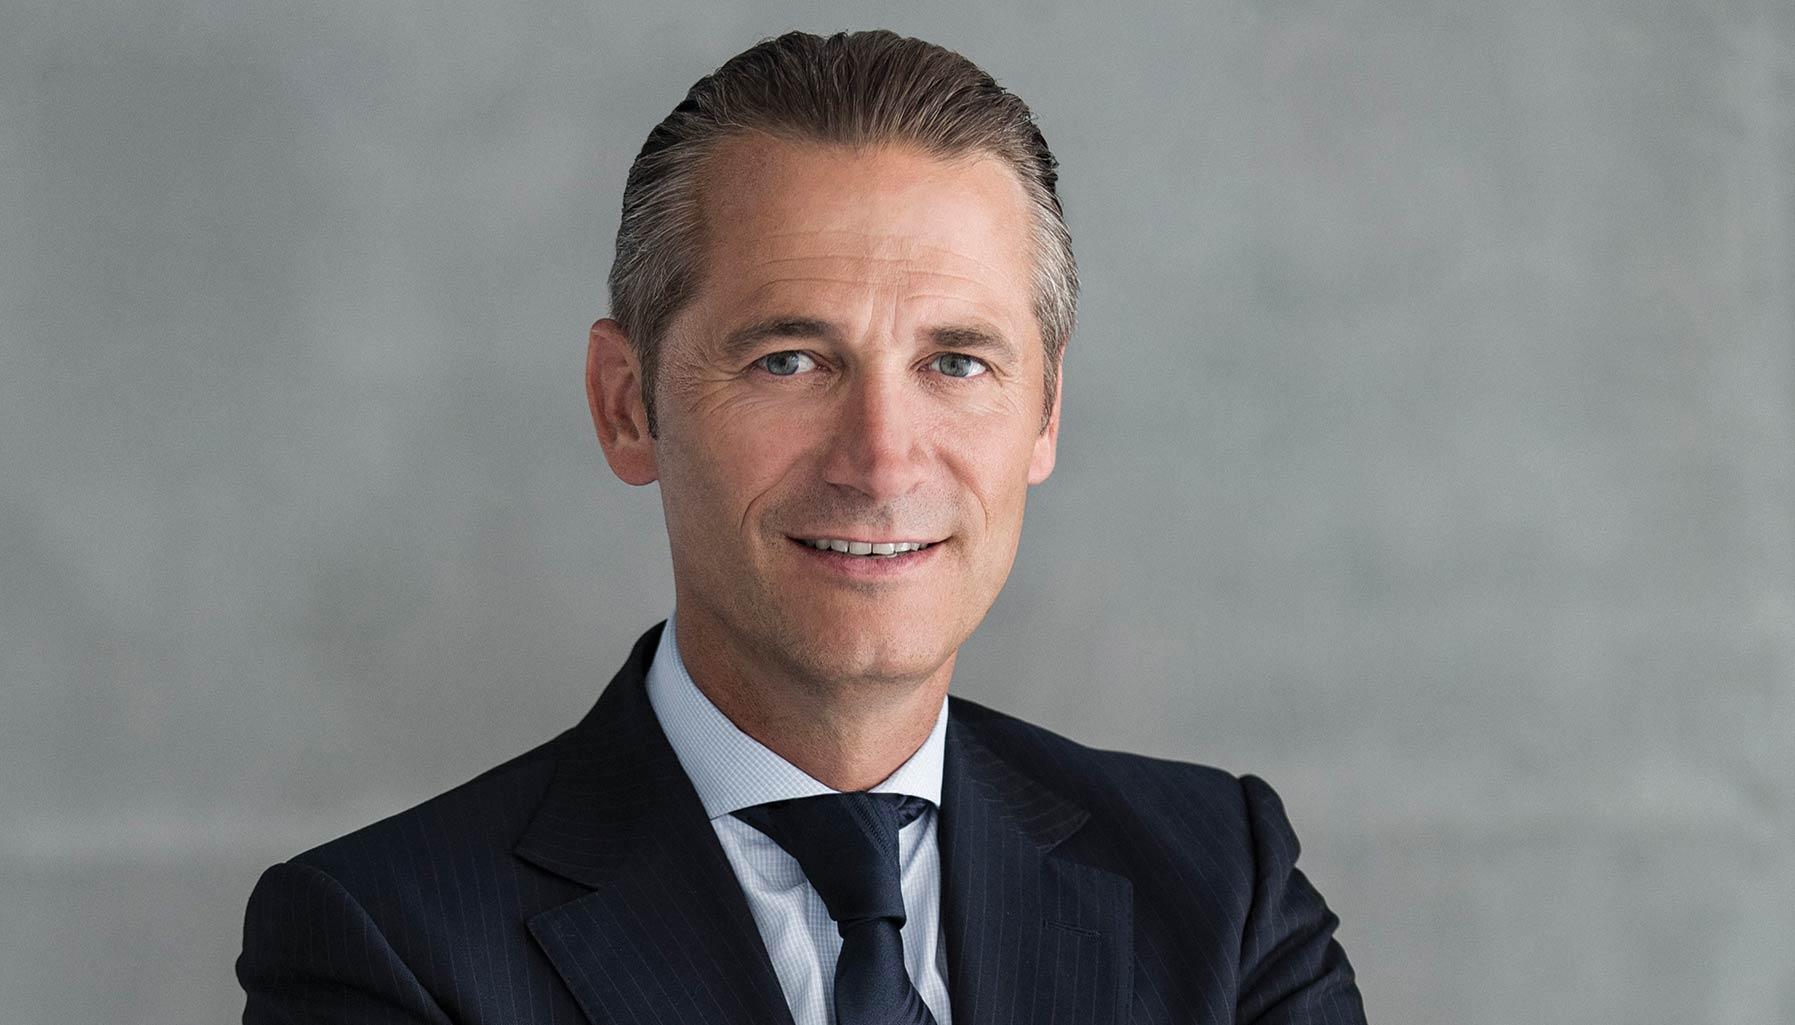 Raynald Aeschlimann, CEO of Omega